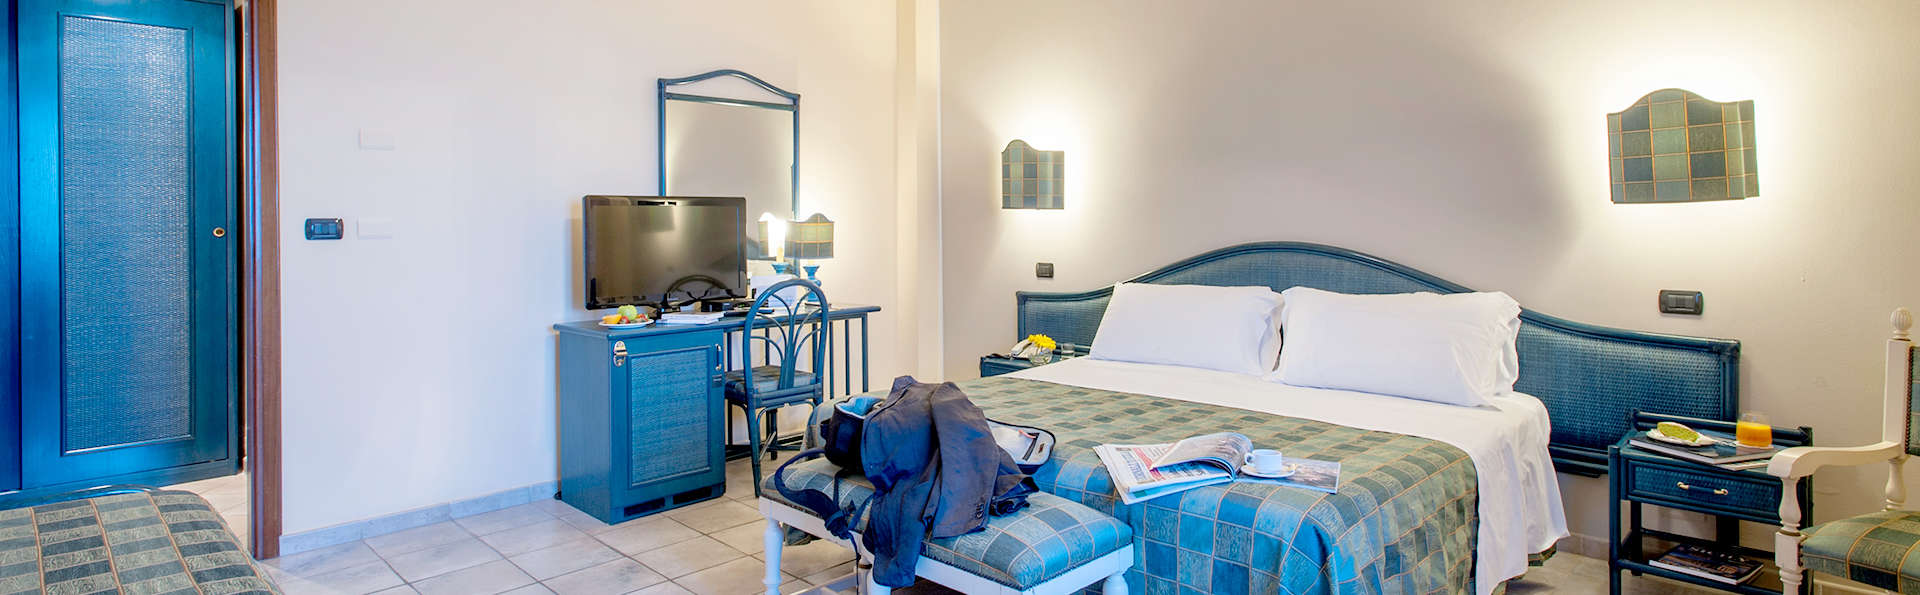 Hotel Baia del Capitano - Edit_Room2.jpg